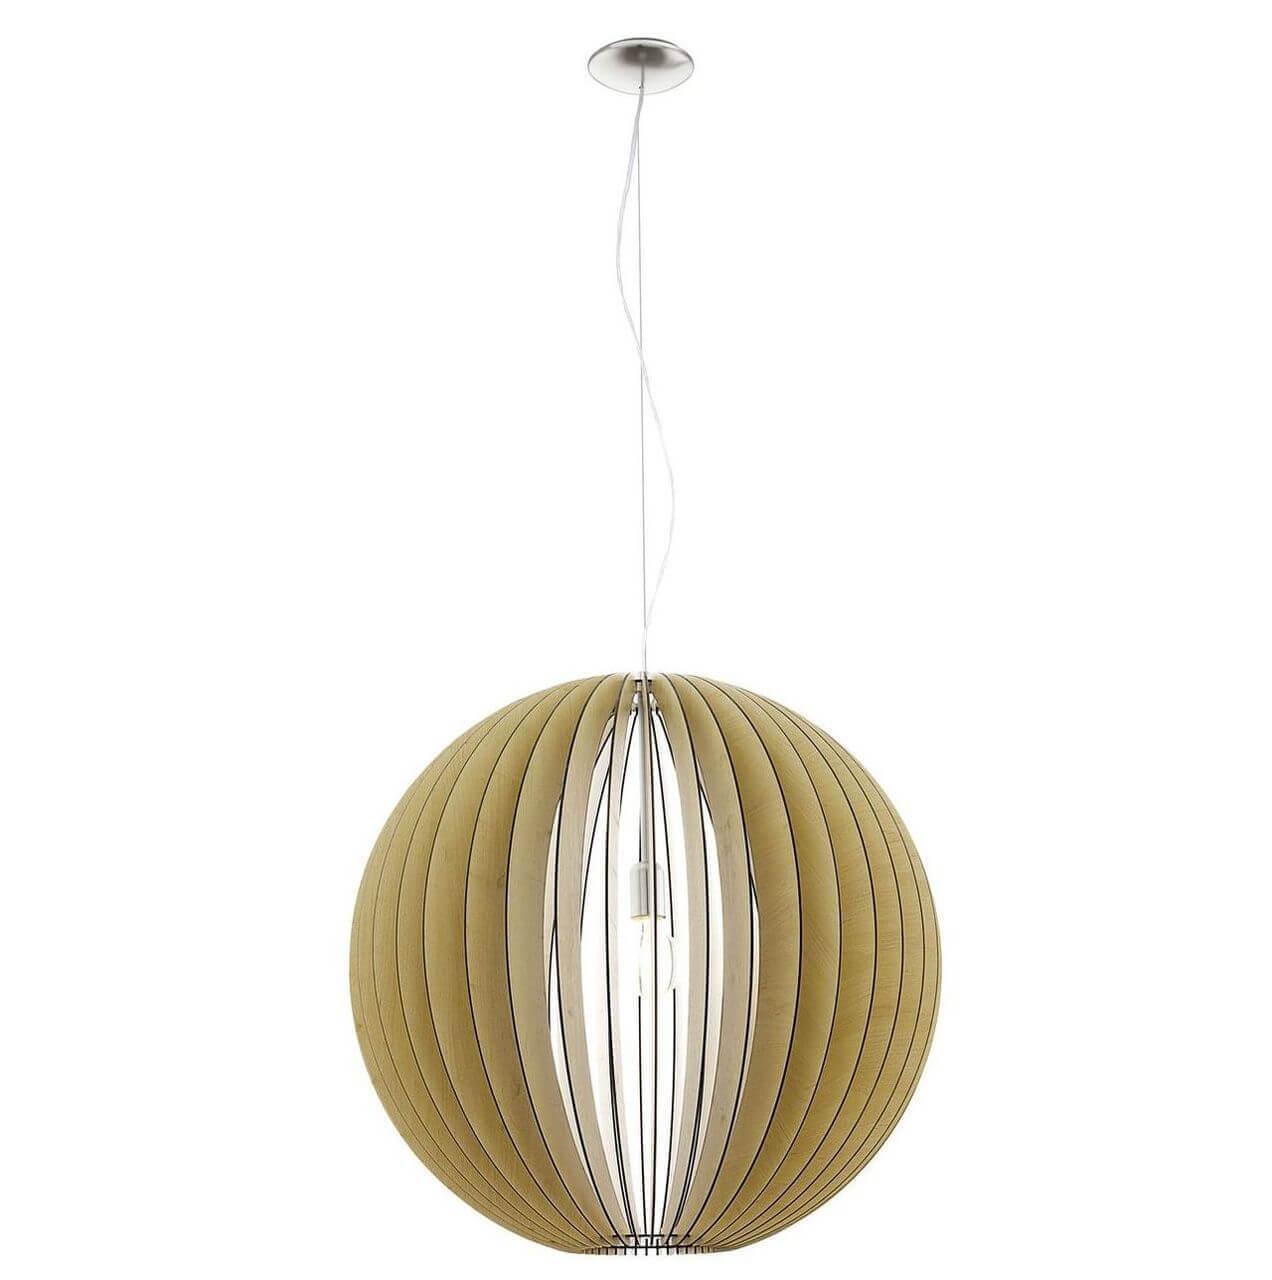 Светильник Eglo 94766 Cossano настольная лампа eglo 94956 cossano